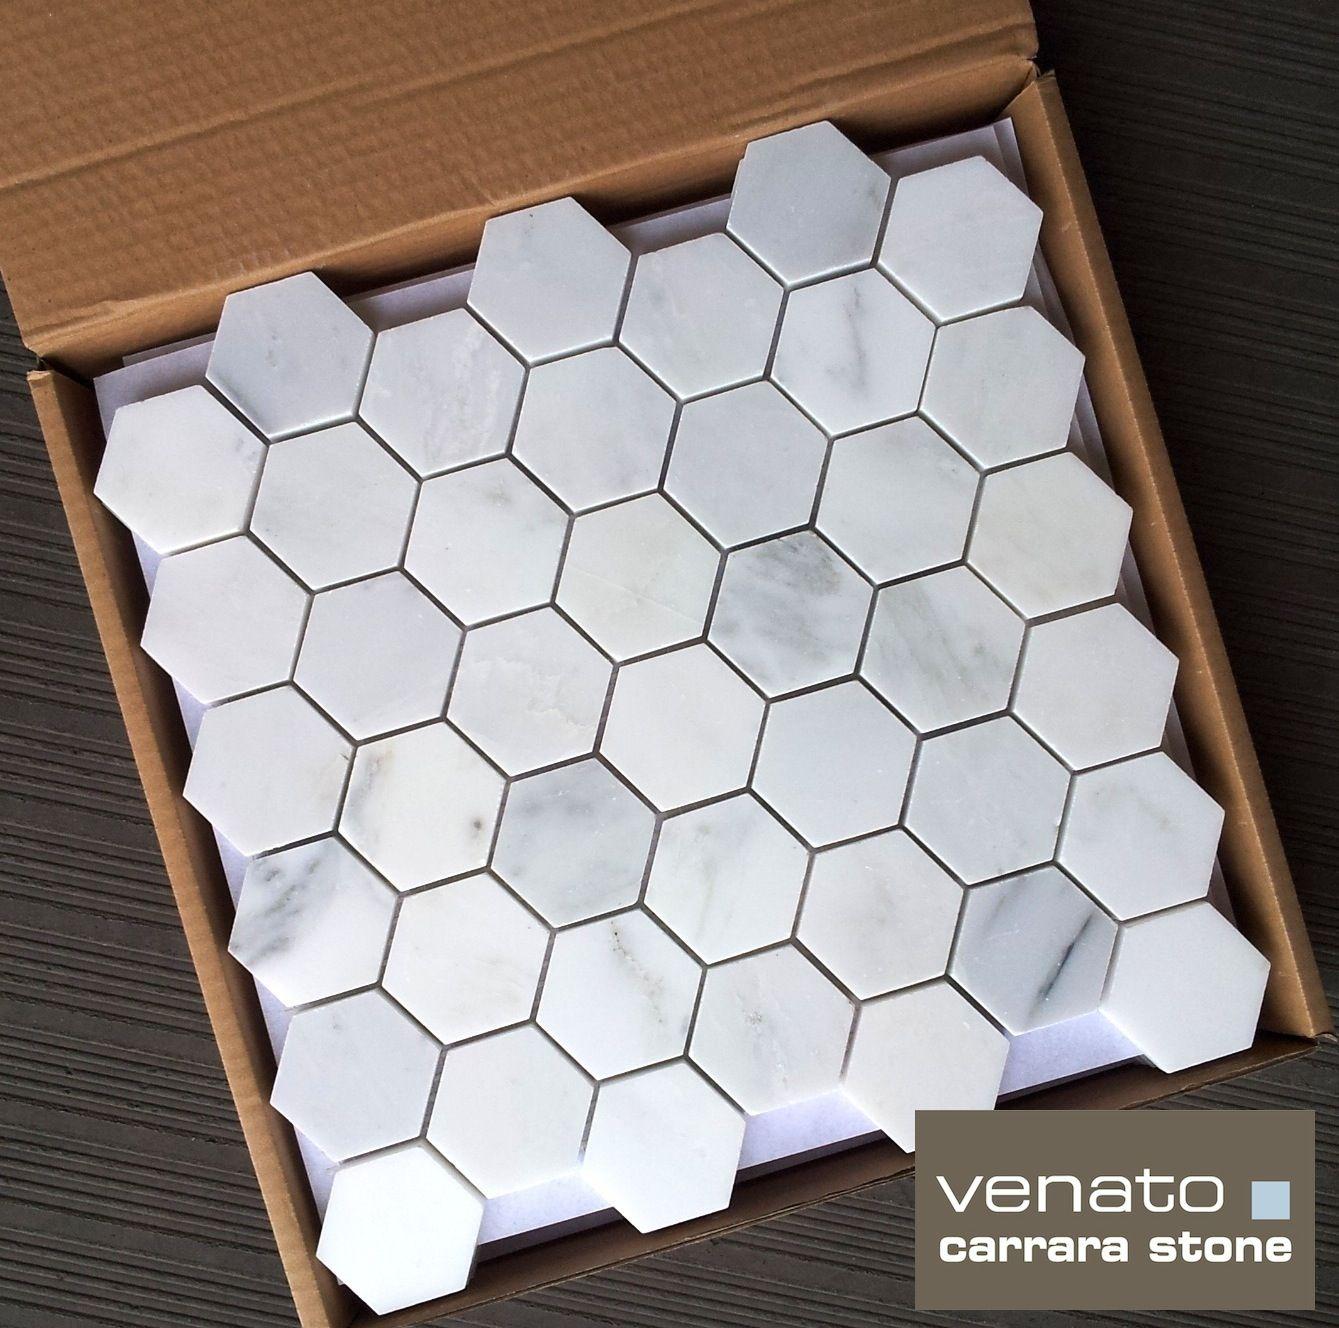 1175sf carrara venato 2x2 hexagon mosaic exclusively from 1175sf carrara venato 2x2 hexagon mosaic exclusively from thebuilderdepot dailygadgetfo Gallery